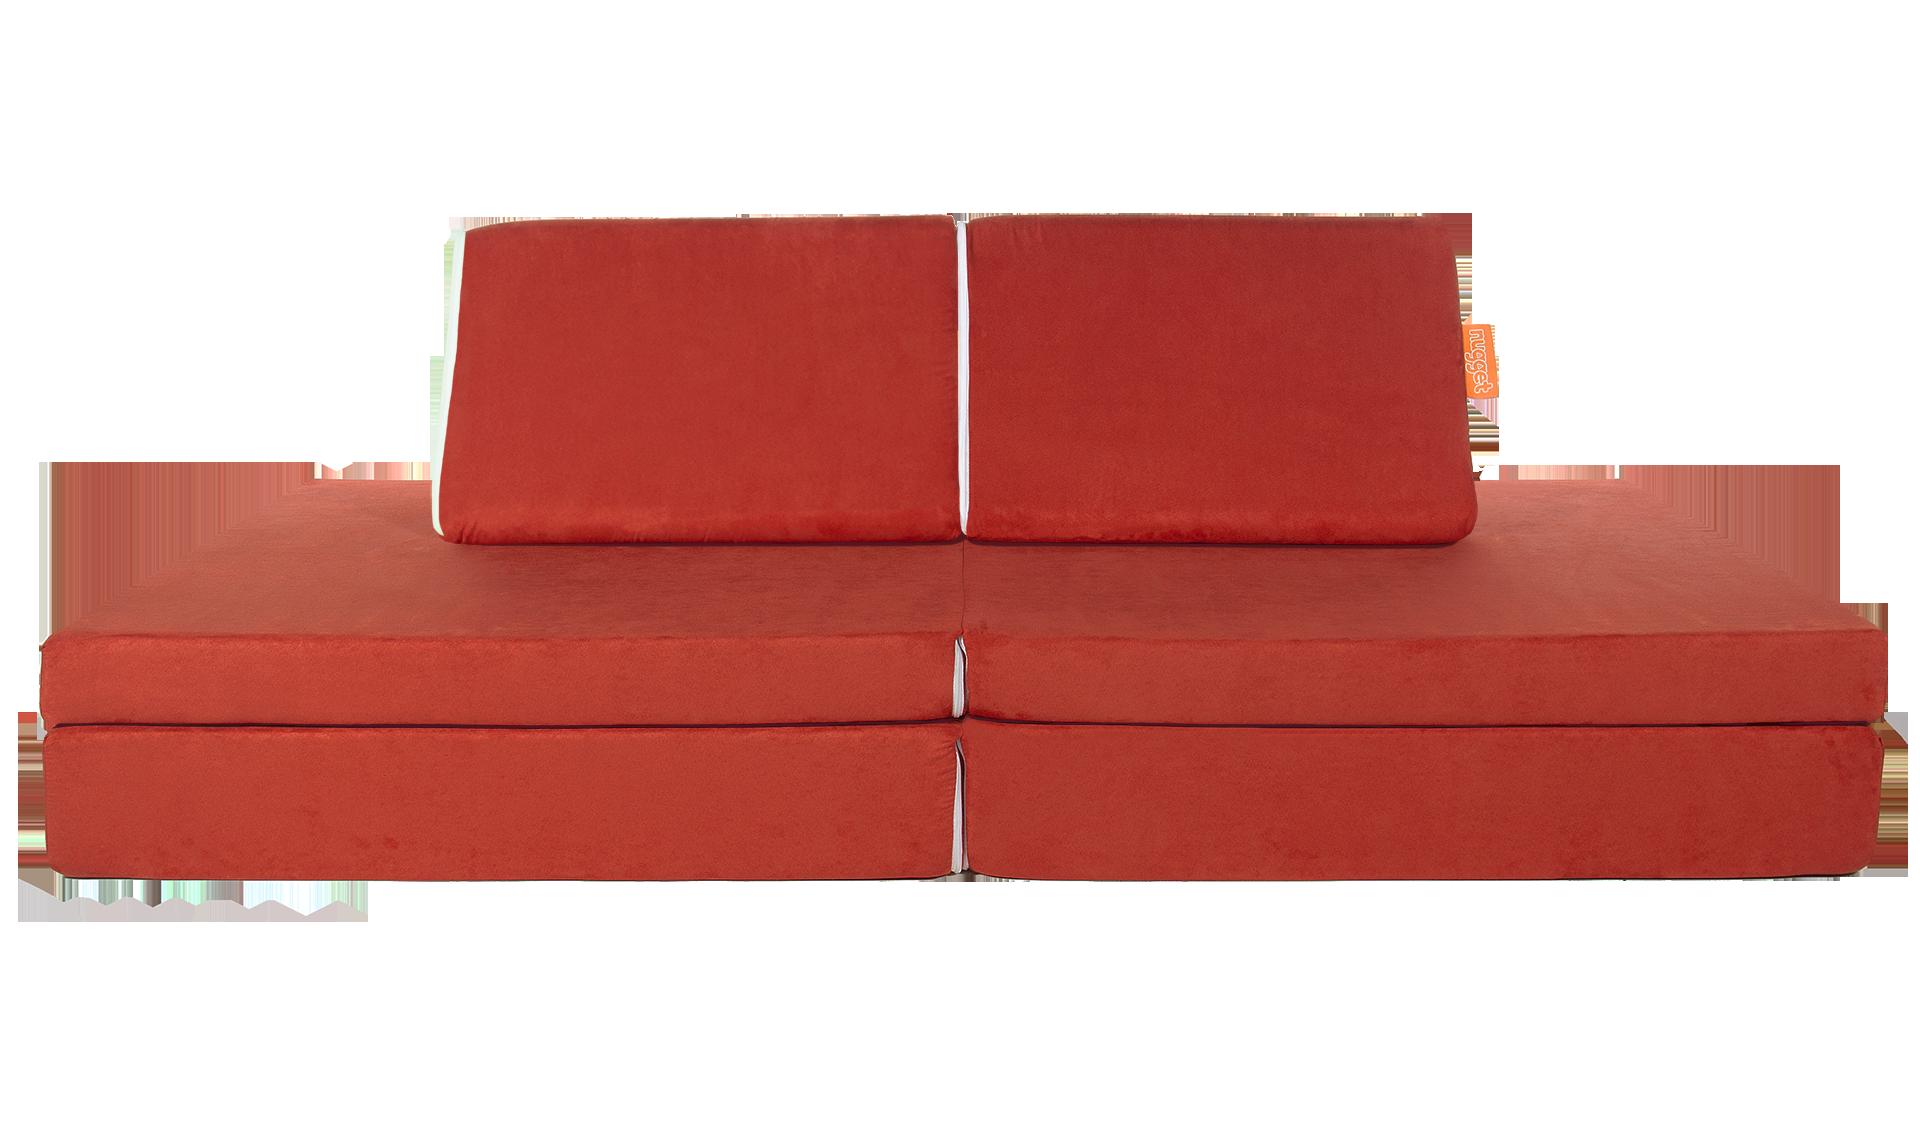 Popular blue | Kids chairs, Kids playroom furniture, Kids sofa